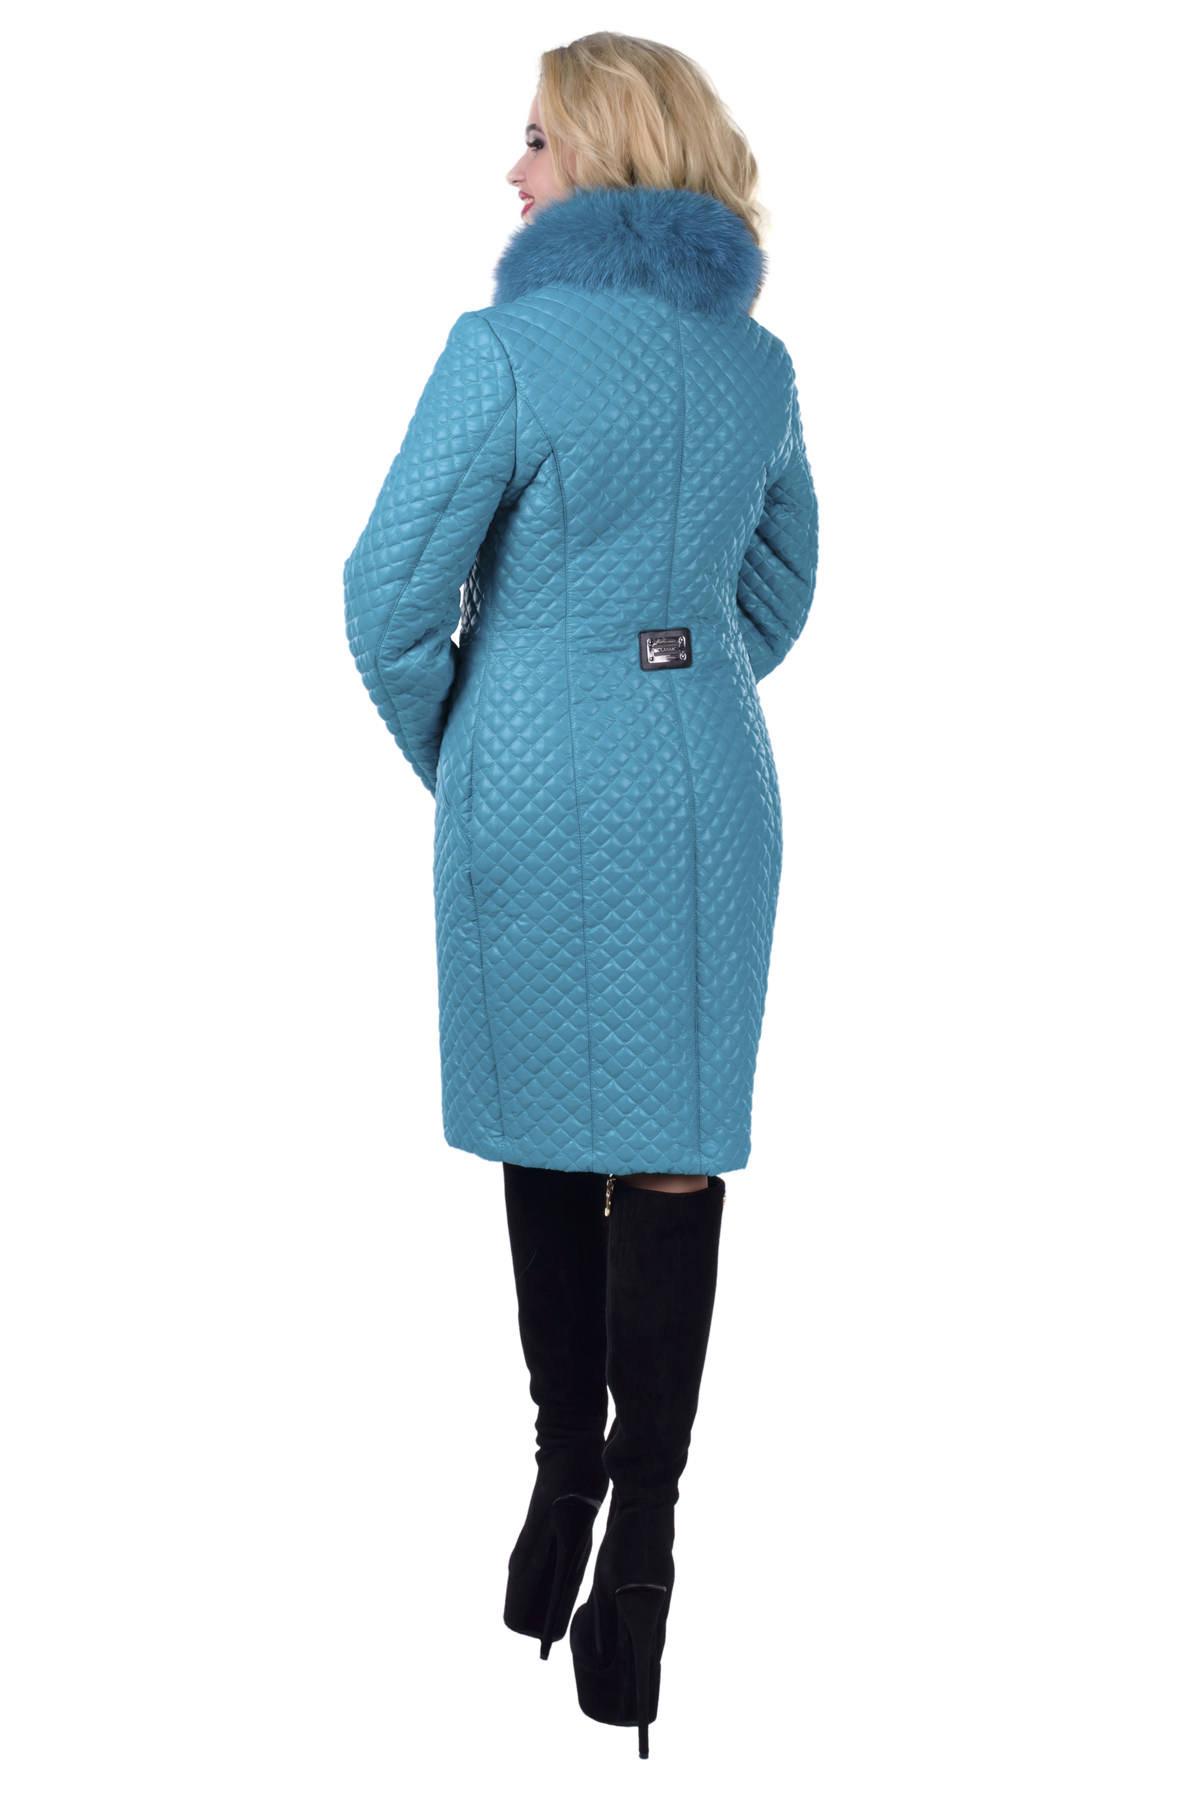 Пальто зима Андрия 0209 Цвет: Бирюза